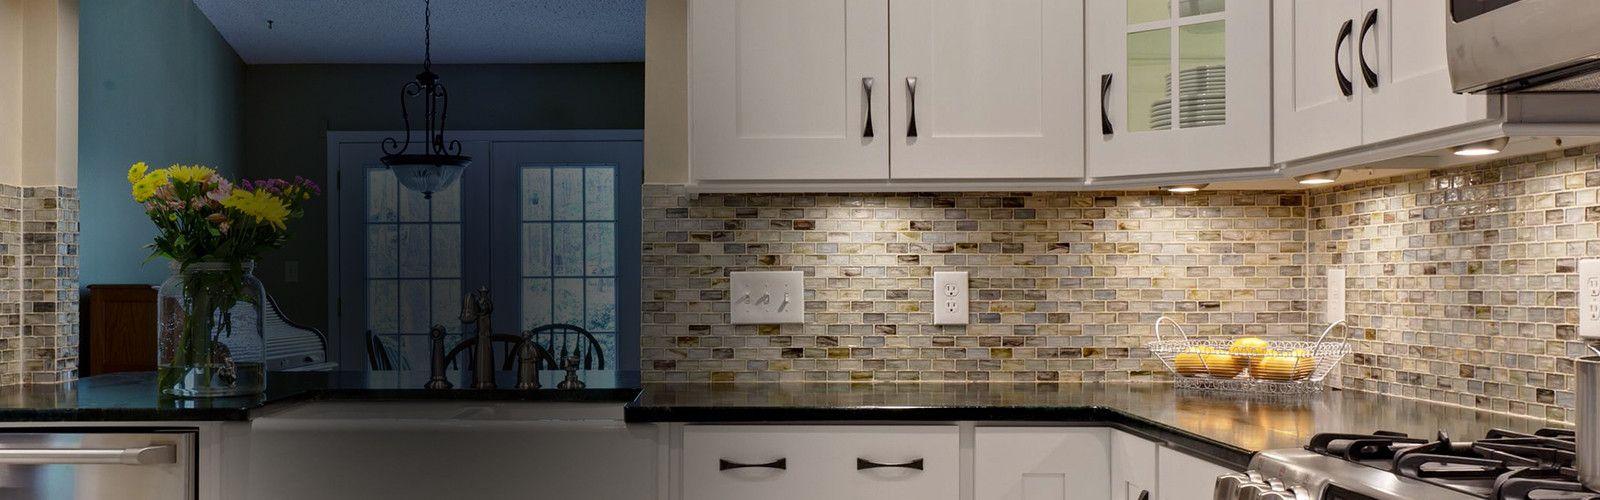 Merveilleux 20+ Cabinet Warehouse Columbus Ga   Kitchen Counter Top Ideas Check More At  Http: